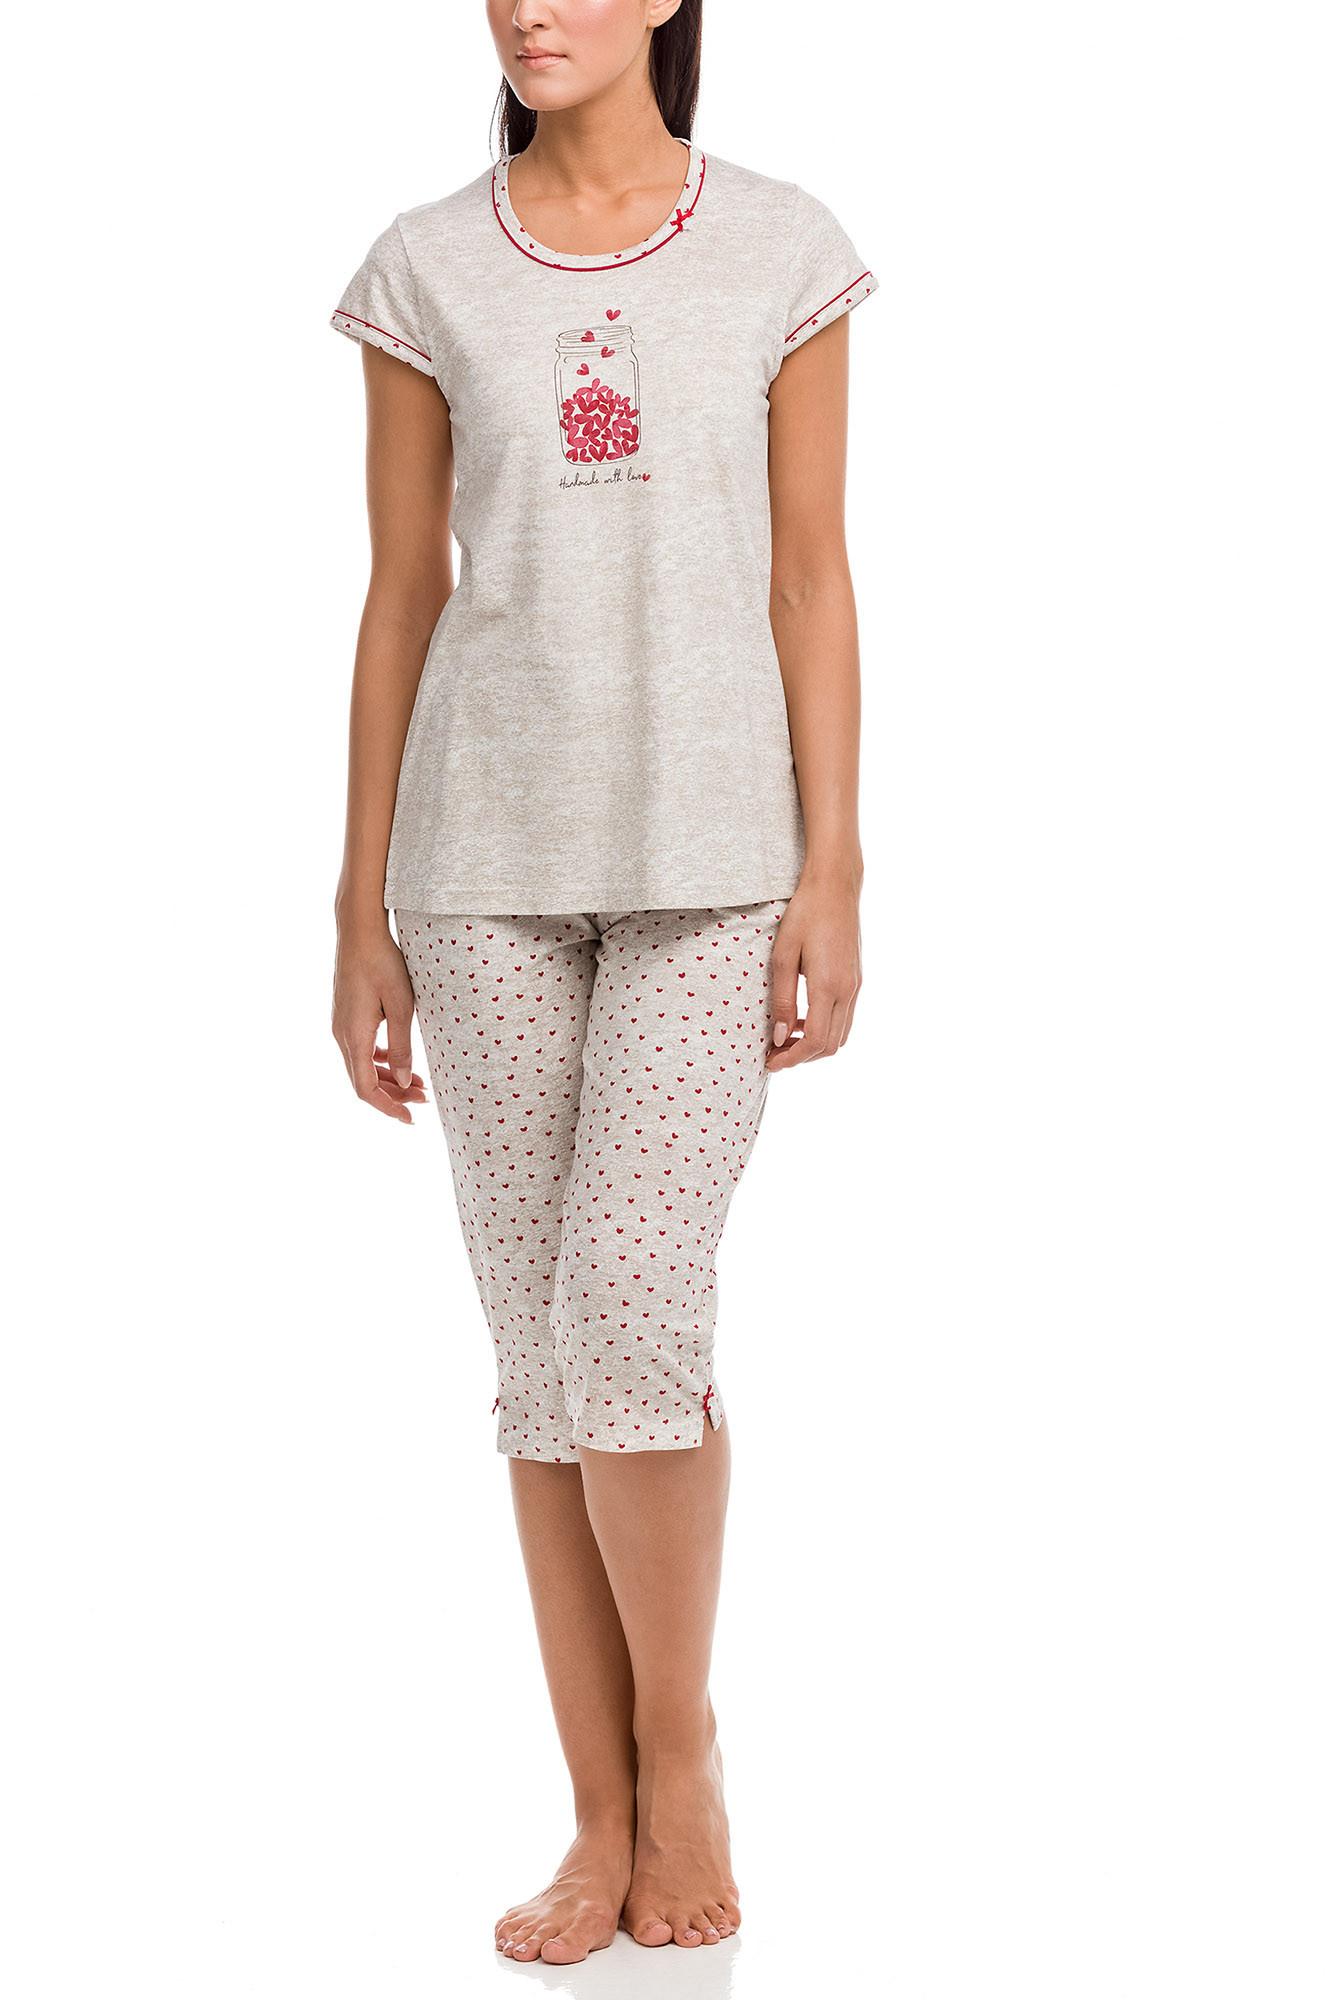 Vamp - Dámske pyžamo 12100 - Vamp beige xxl